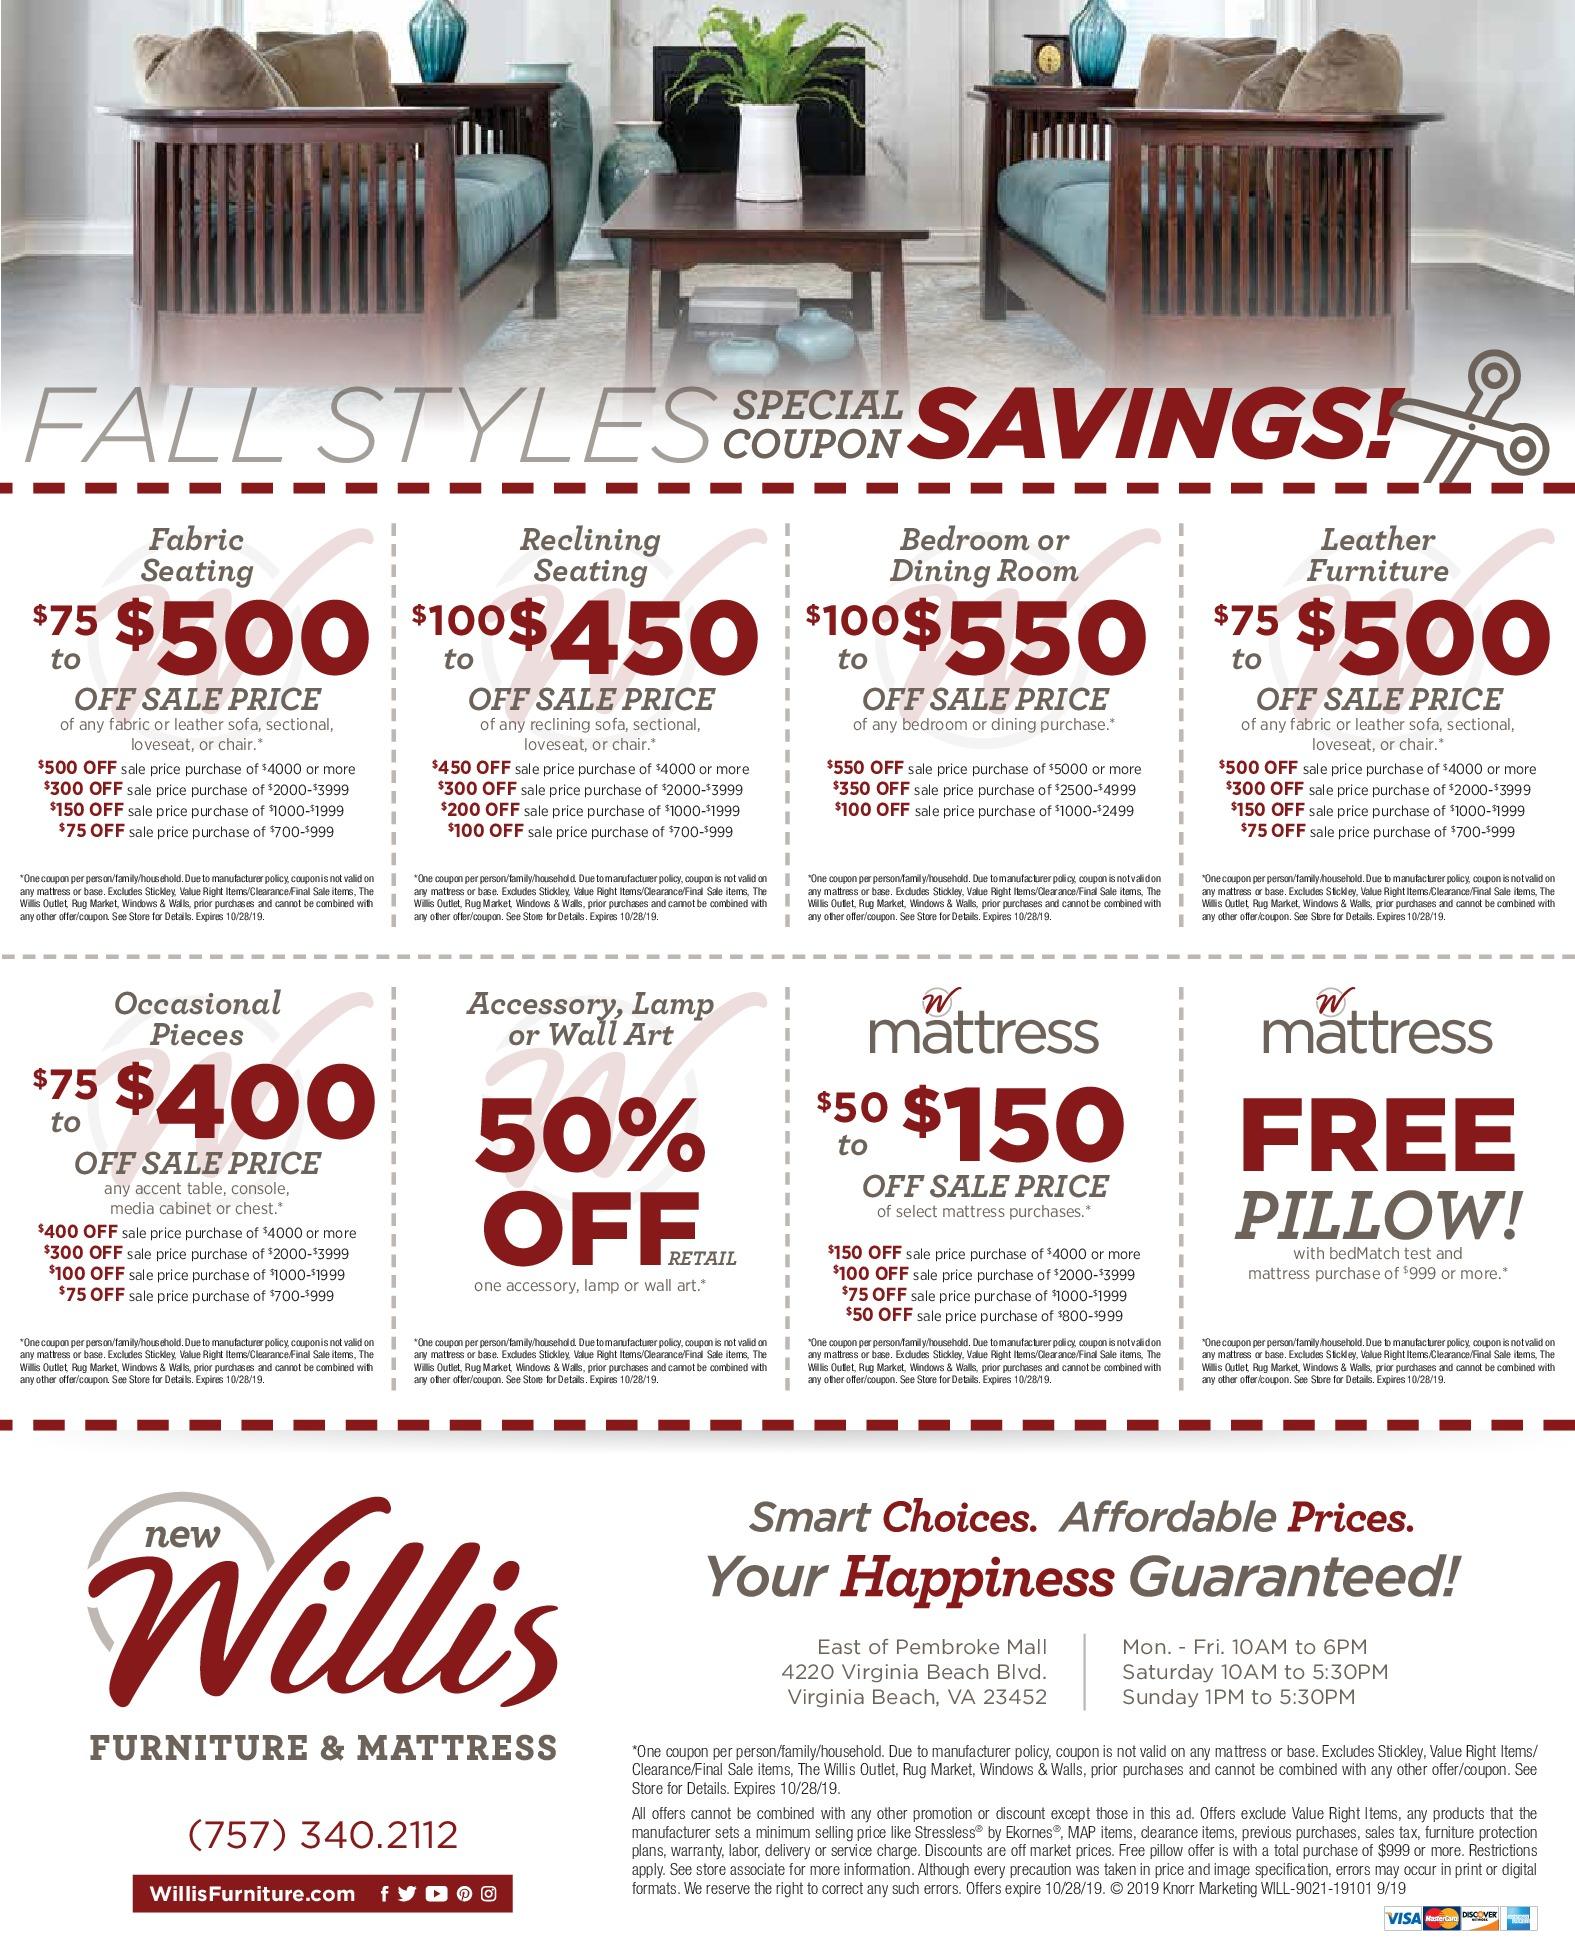 WILL-9021-19101-FallStyles-WebSp